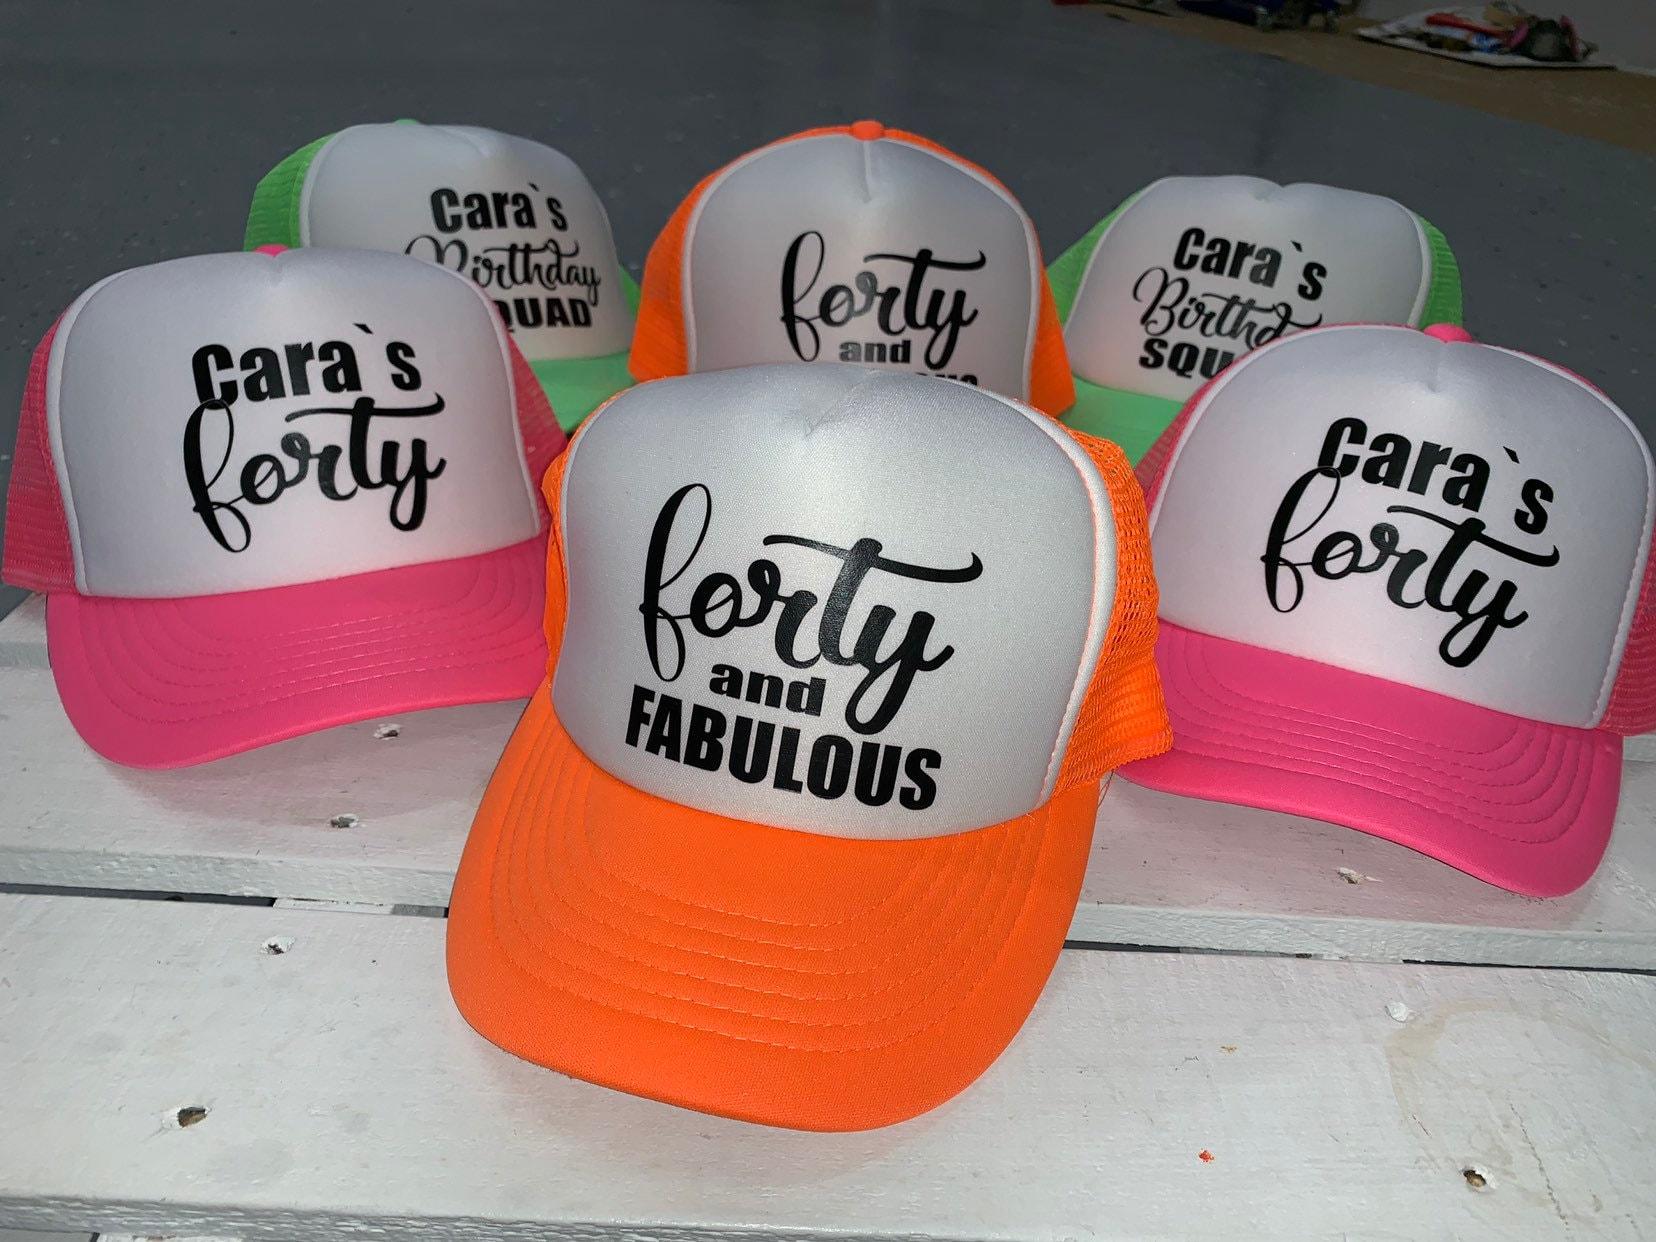 Birthdy Hats 40th Birthday Party HAts 40th Birthday Hat,Trucker Hats CUSTOM HATS 40th Birthday Ideas 40th Birthday Gift for Women Hats